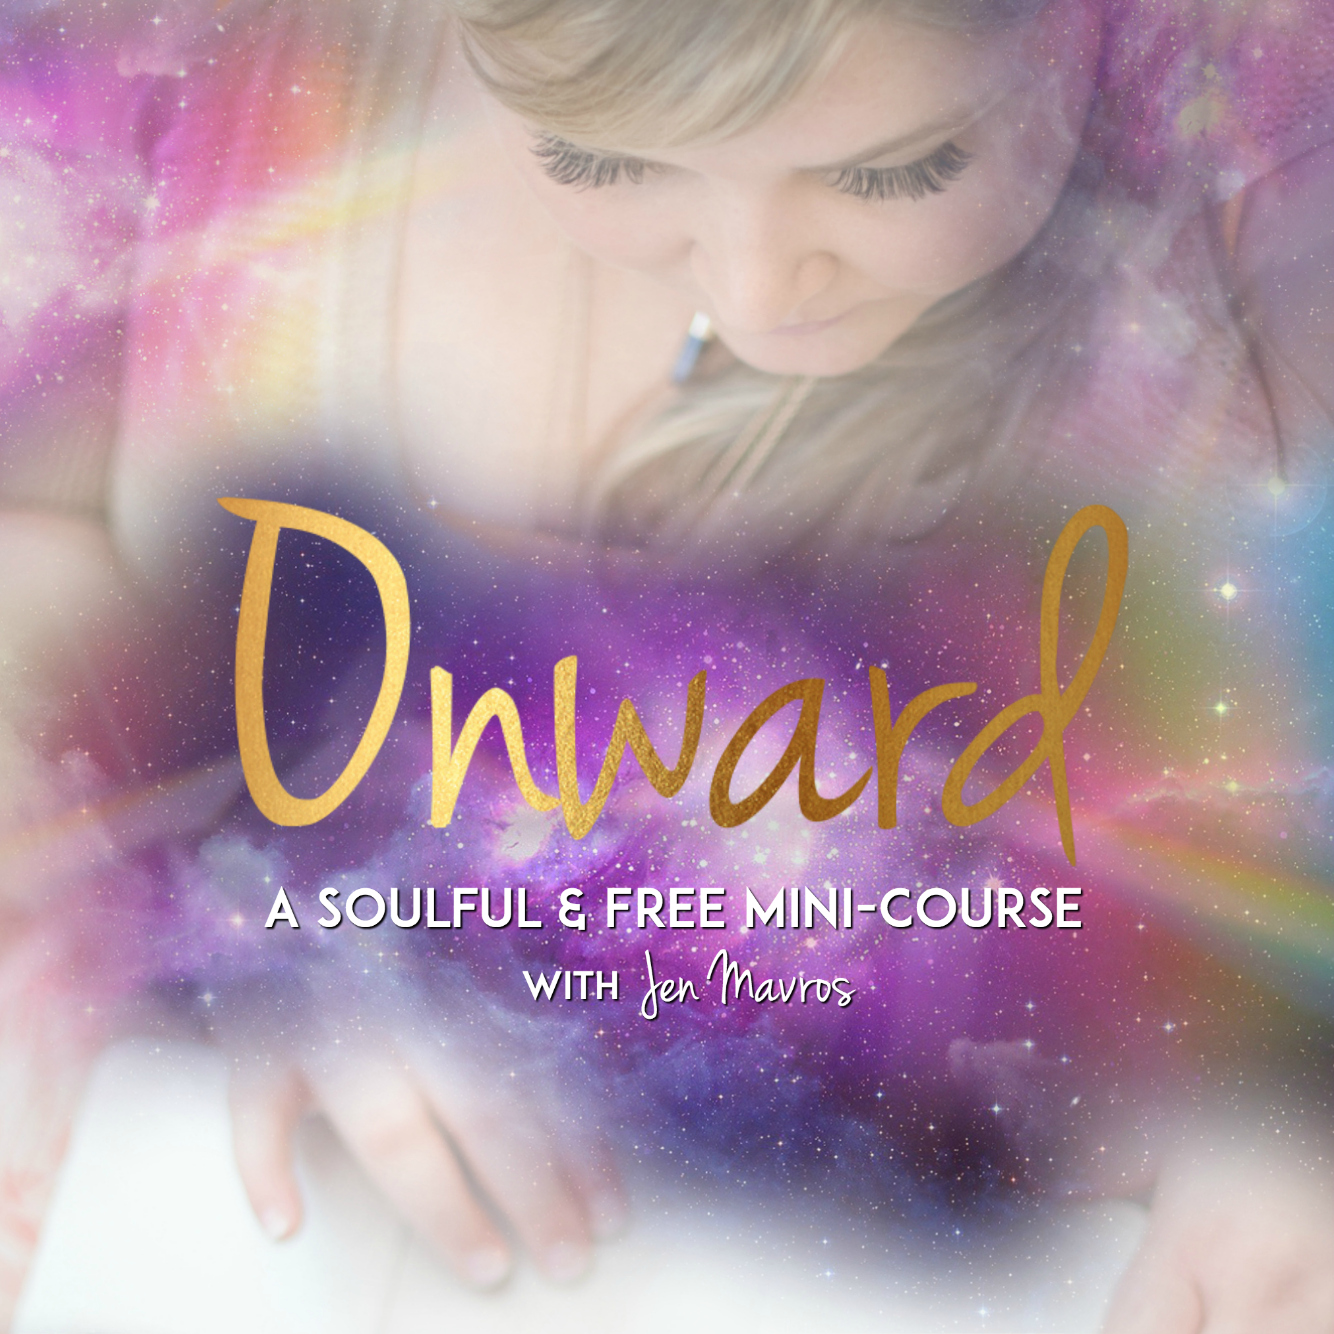 Onward Course 1.jpg